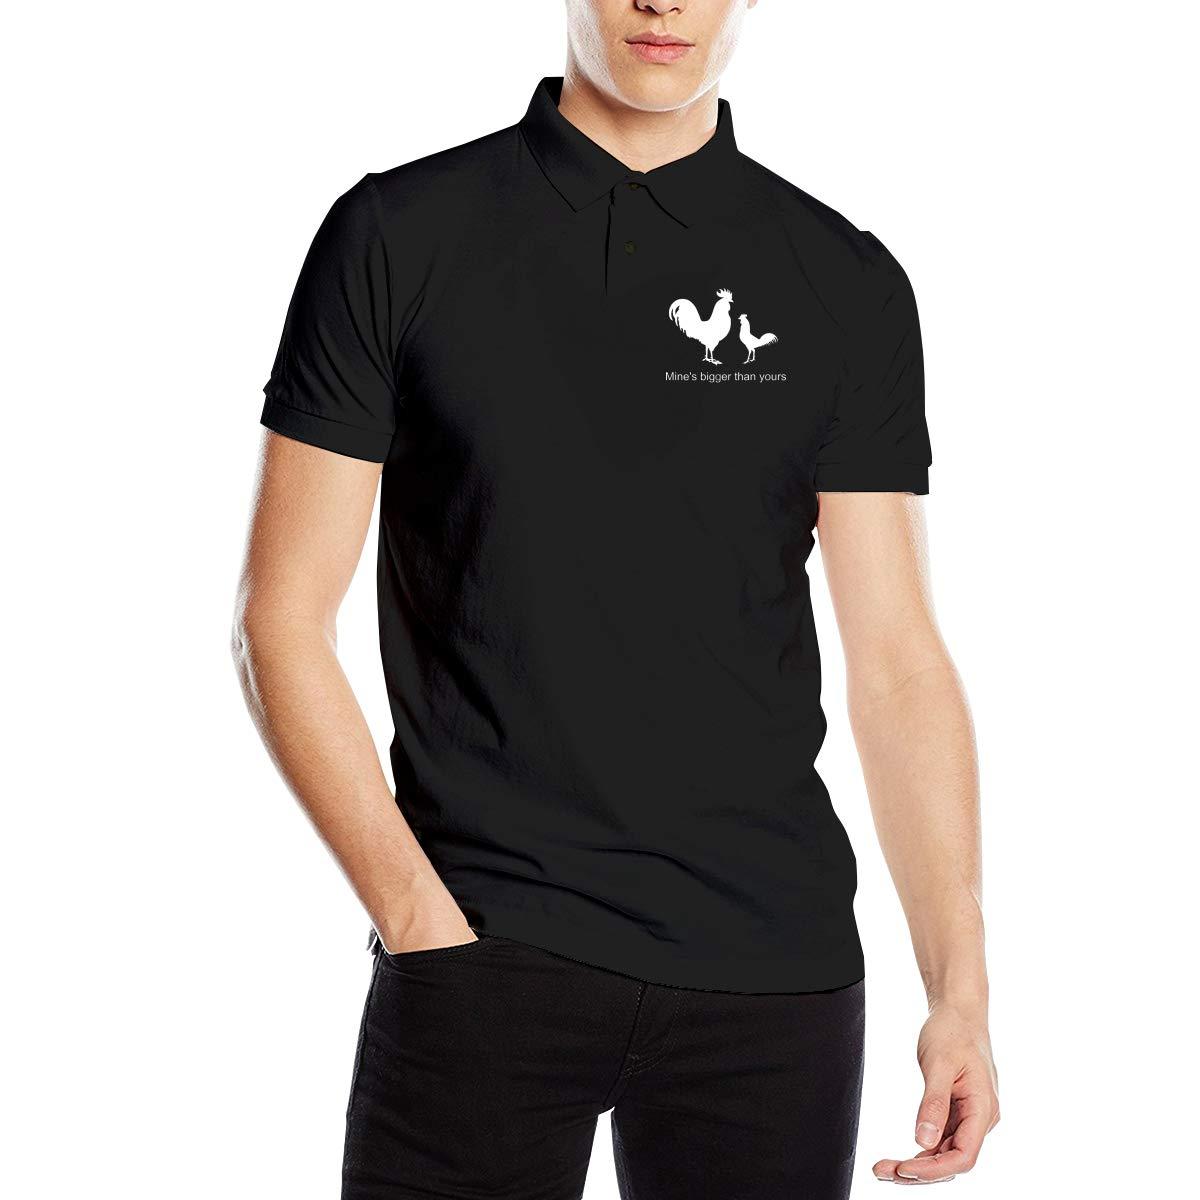 Cjlrqone Roosters Mens Leisure Polo Shirts L Black